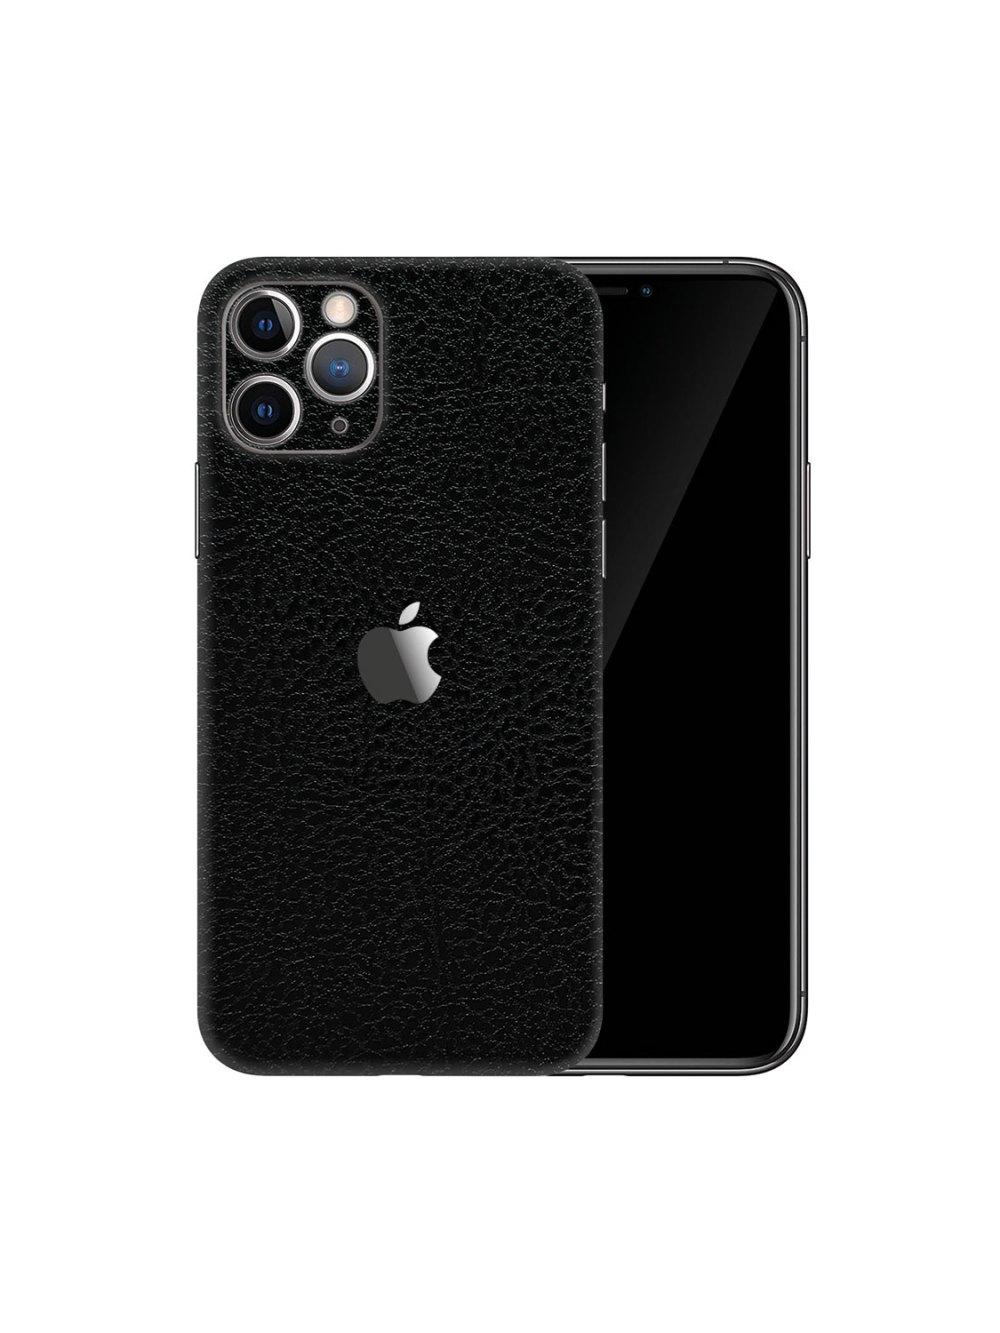 Apple iPhone 11 Max LEATHER Vinyl Skin Wrap